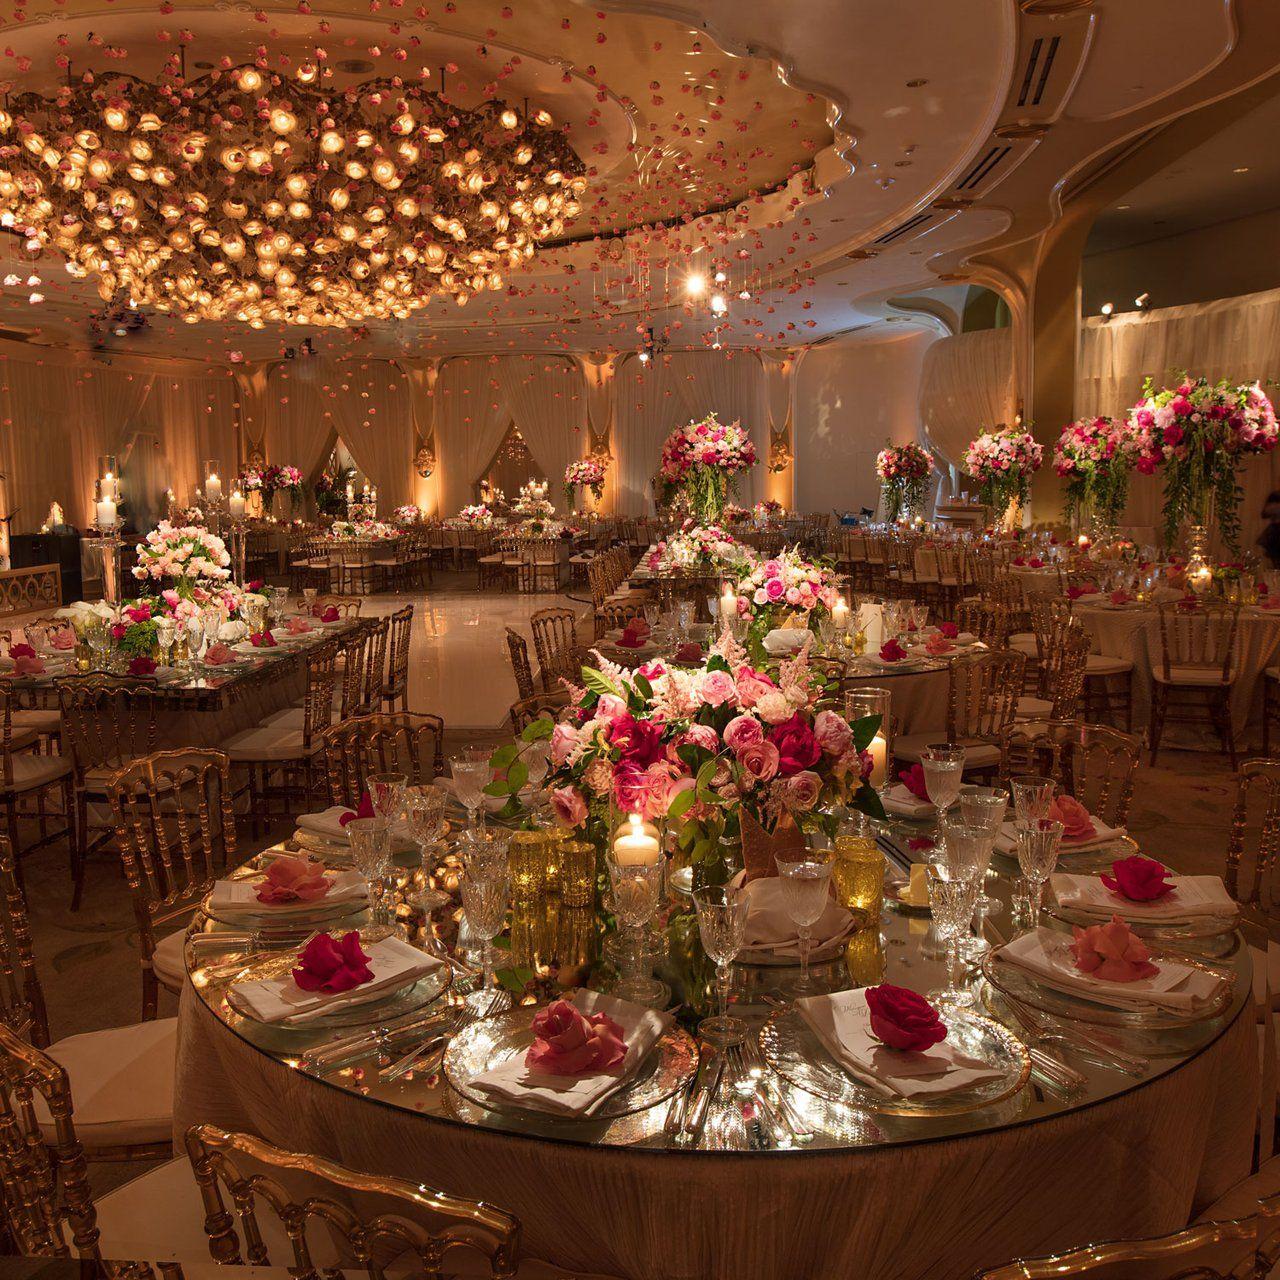 Beverly-hills-hotel-ballroom-wedding-reception-pink-roses